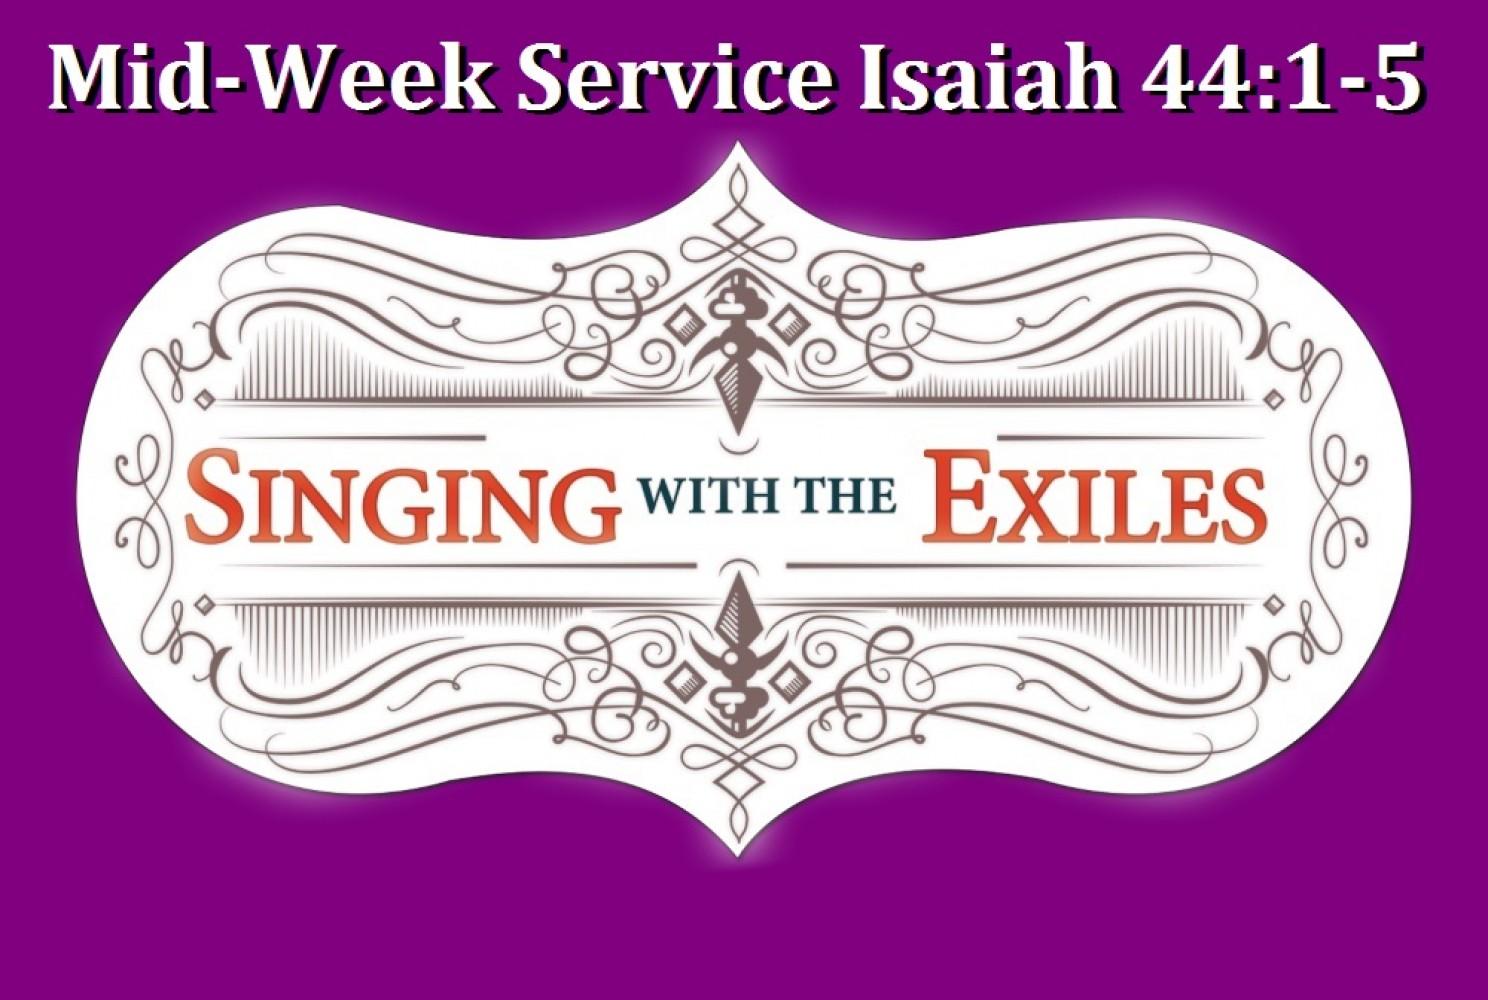 Lenten Exchange Mid-Week Isaiah 44:1-5 - Pastor Jim Chimirri-Russell